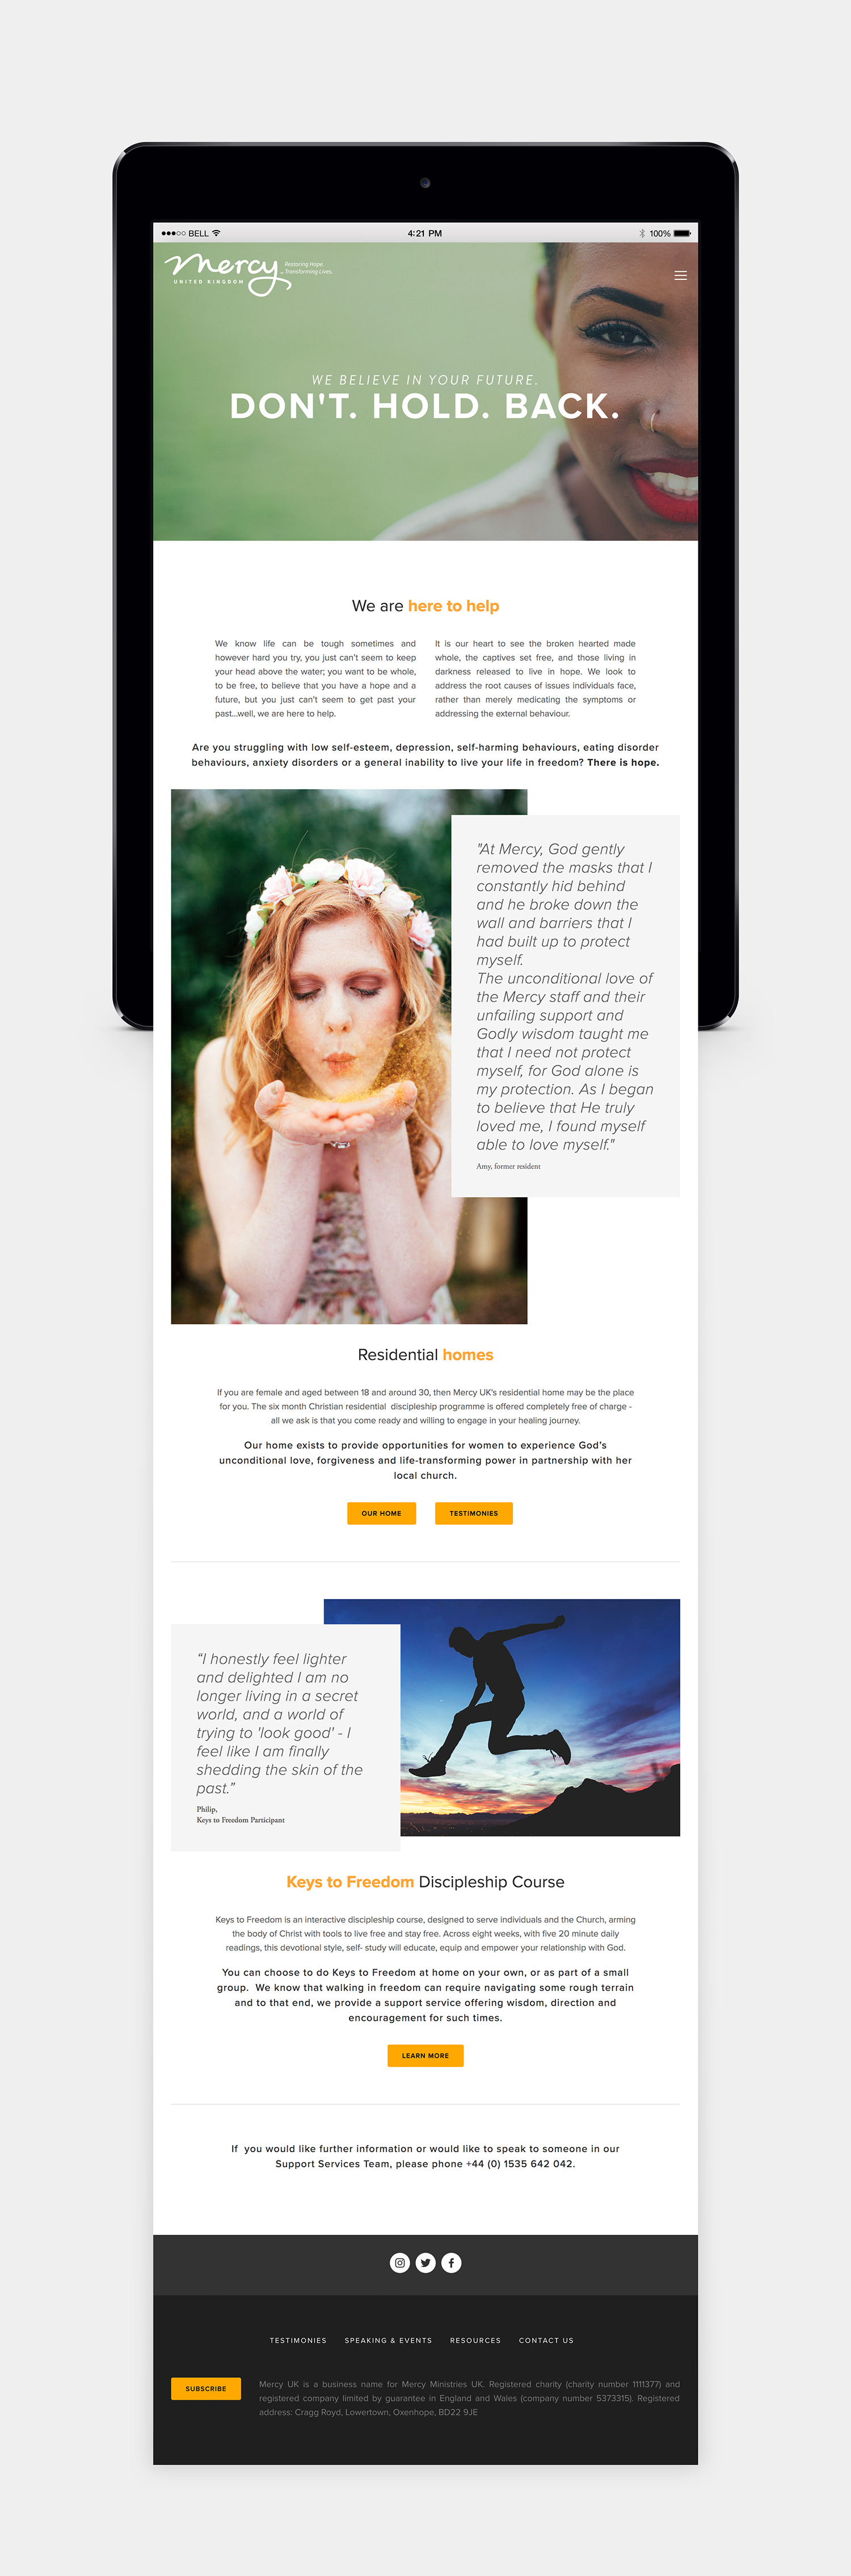 Mercy-Web-Design-Big-Blond-Bear-Branding-4.jpg